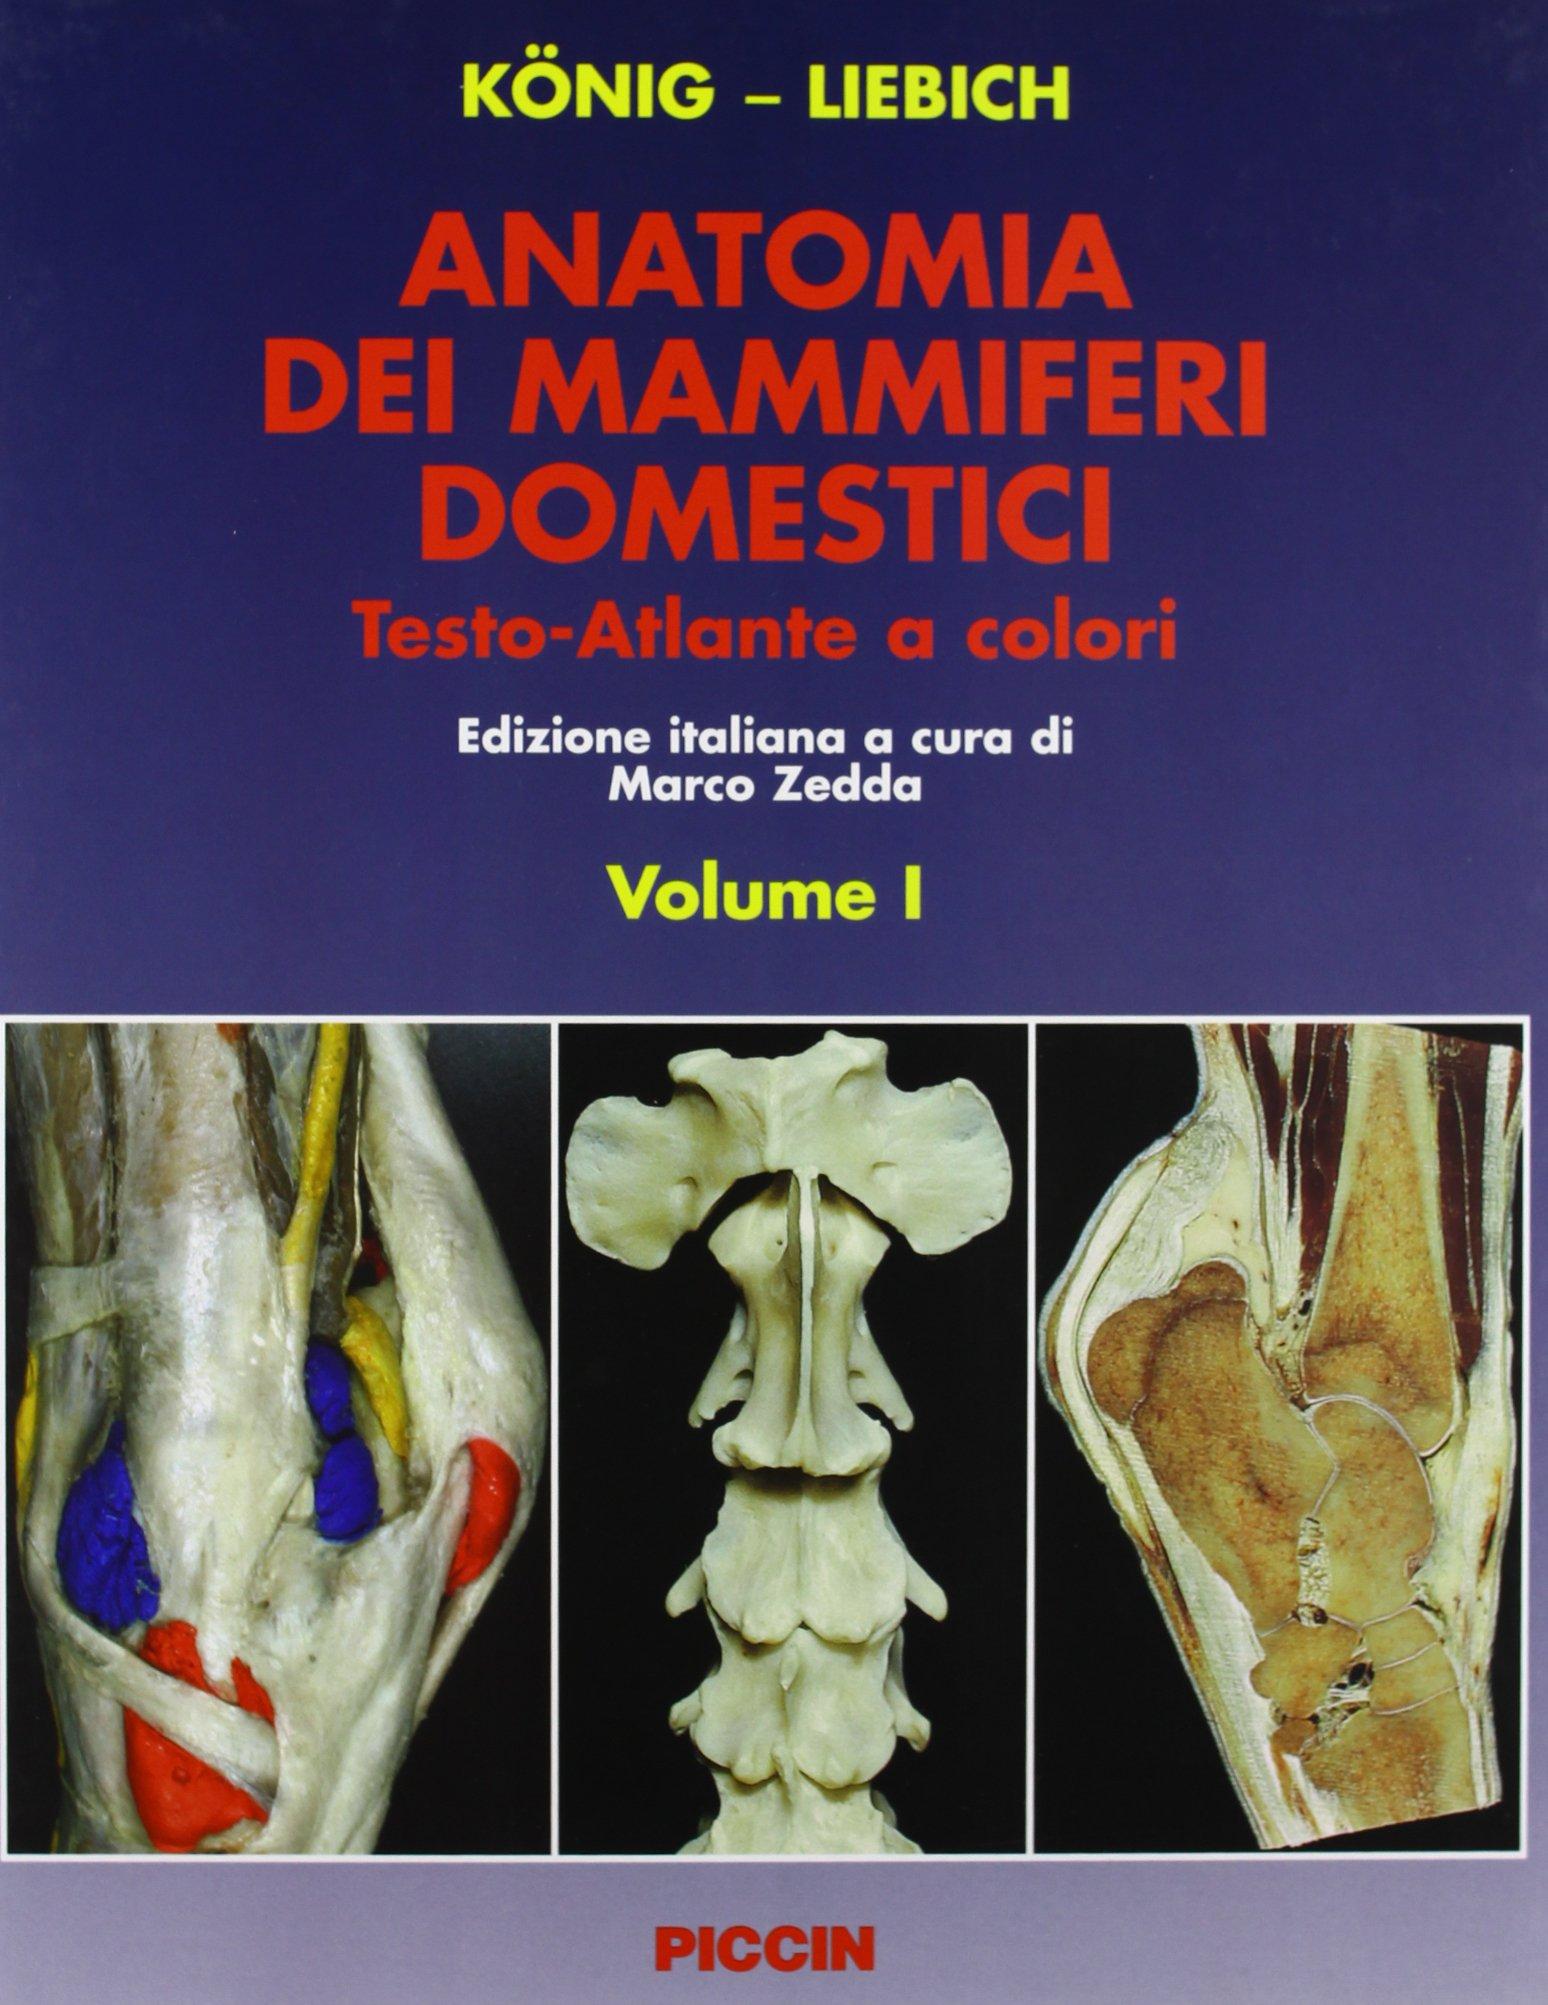 Anatomia dei mammiferi domestici (Volume I + Volume II) Copertina rigida – 31 gen 2005 Horst E. König Hans-Georg Liebich M. Zedda Piccin-Nuova Libraria